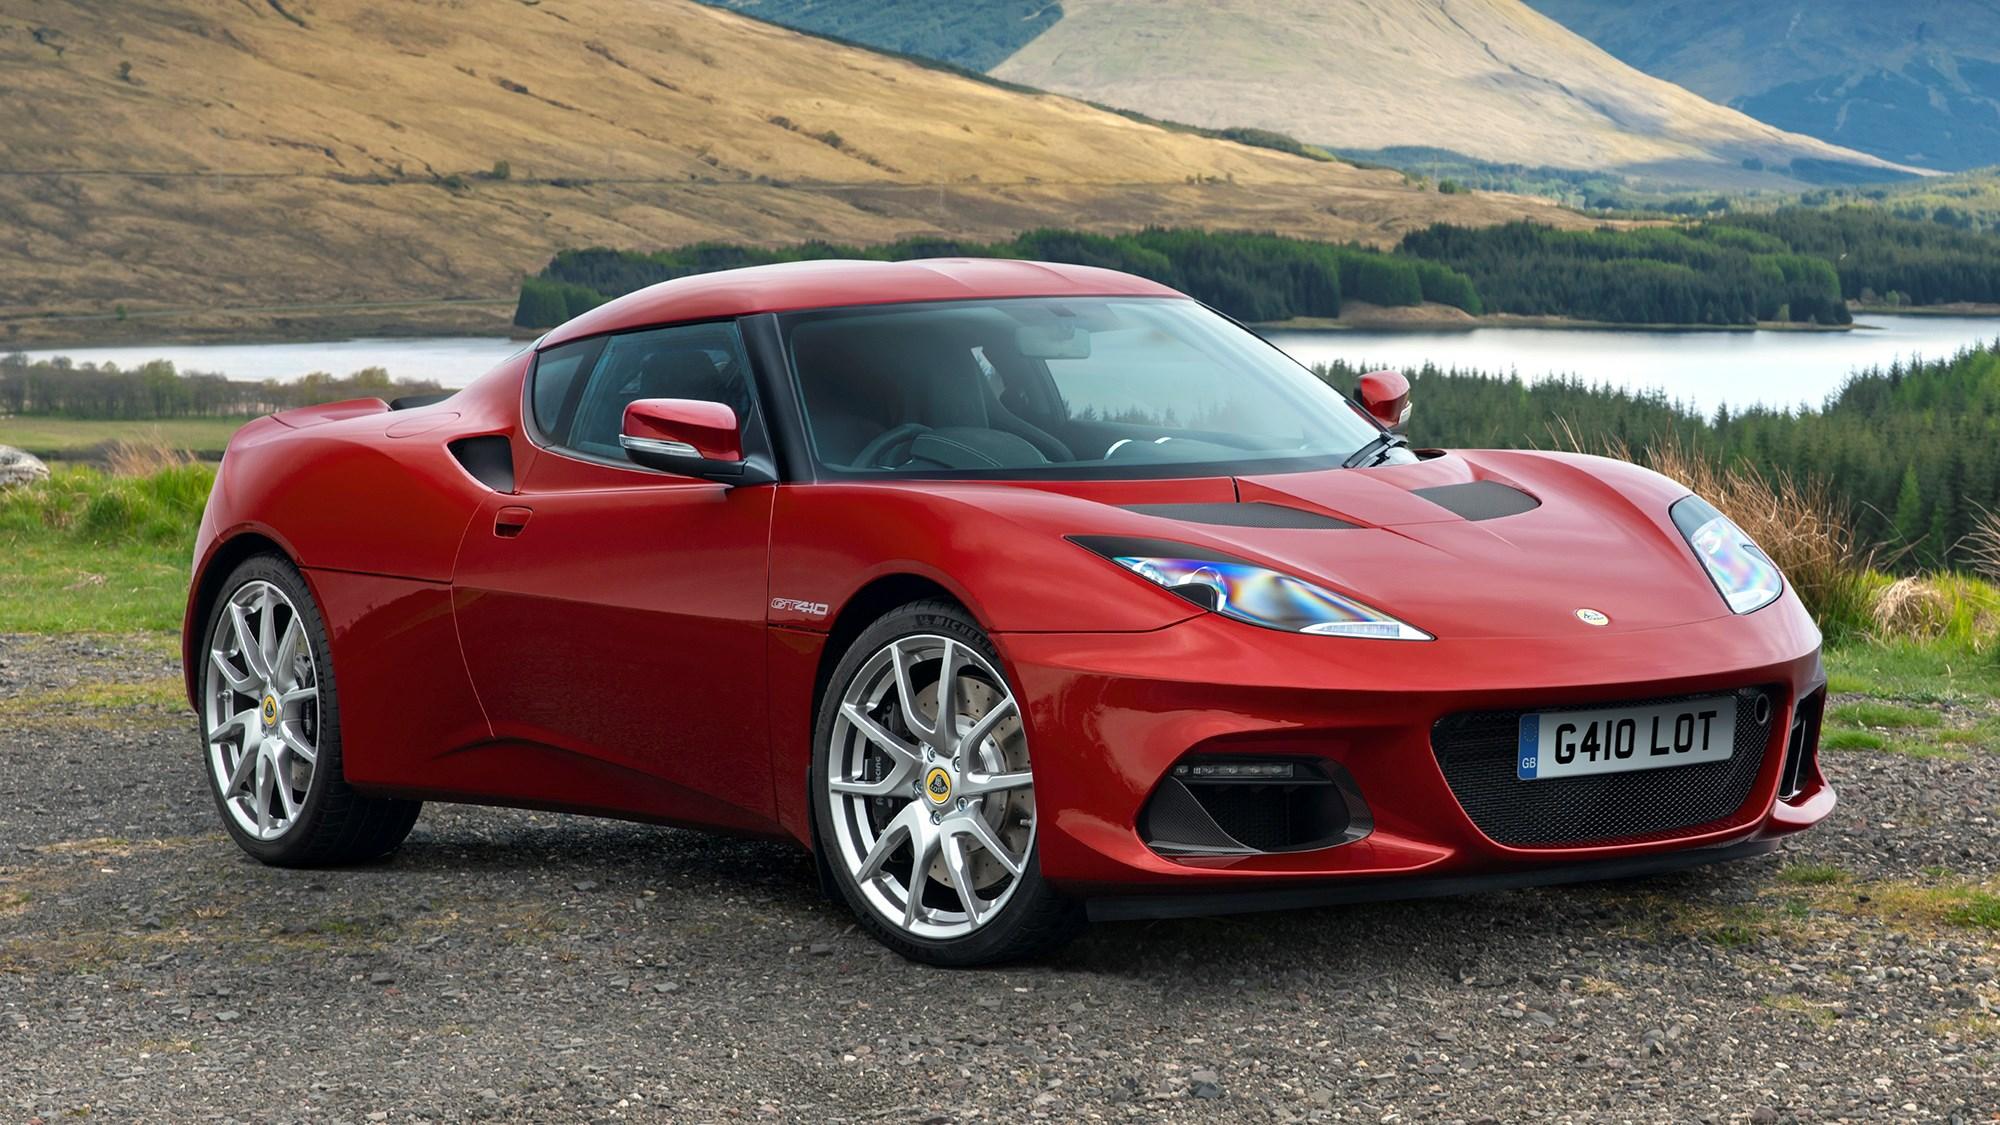 Lotus Evora: entry-level GT410 revealed | CAR Magazine